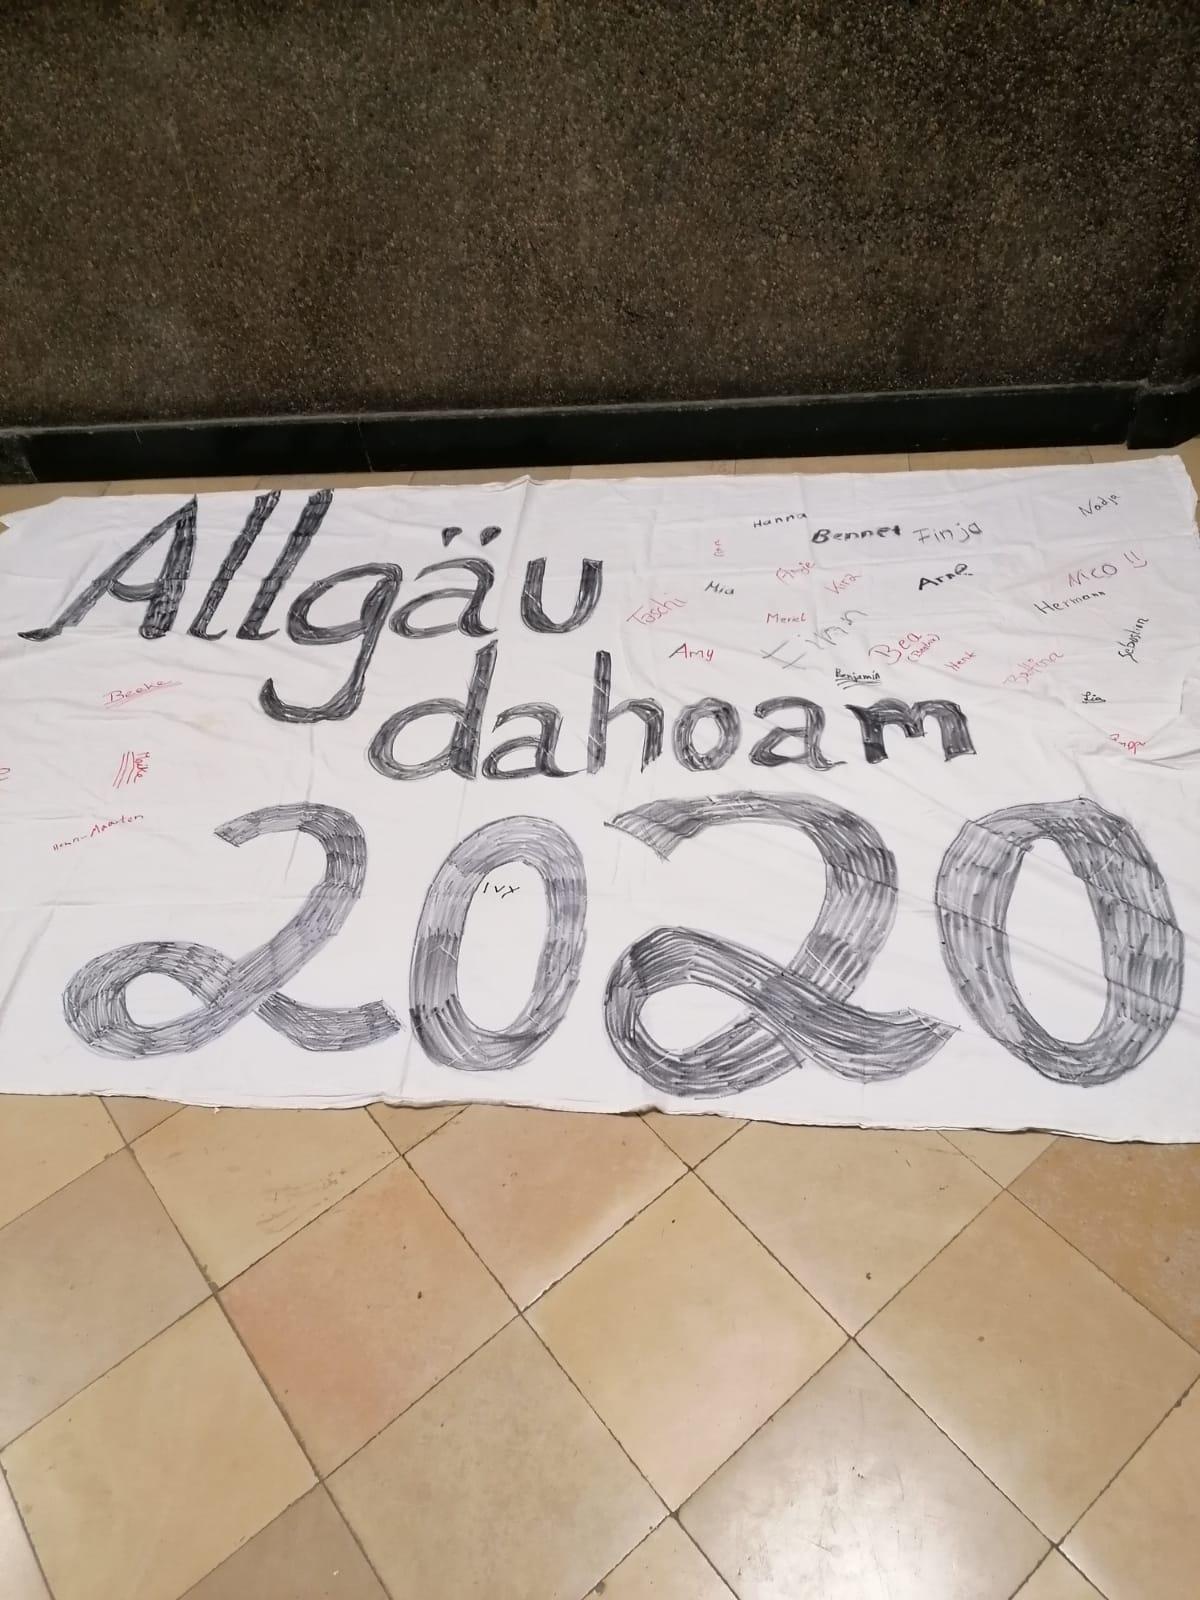 Allgäu Dahoam 2020